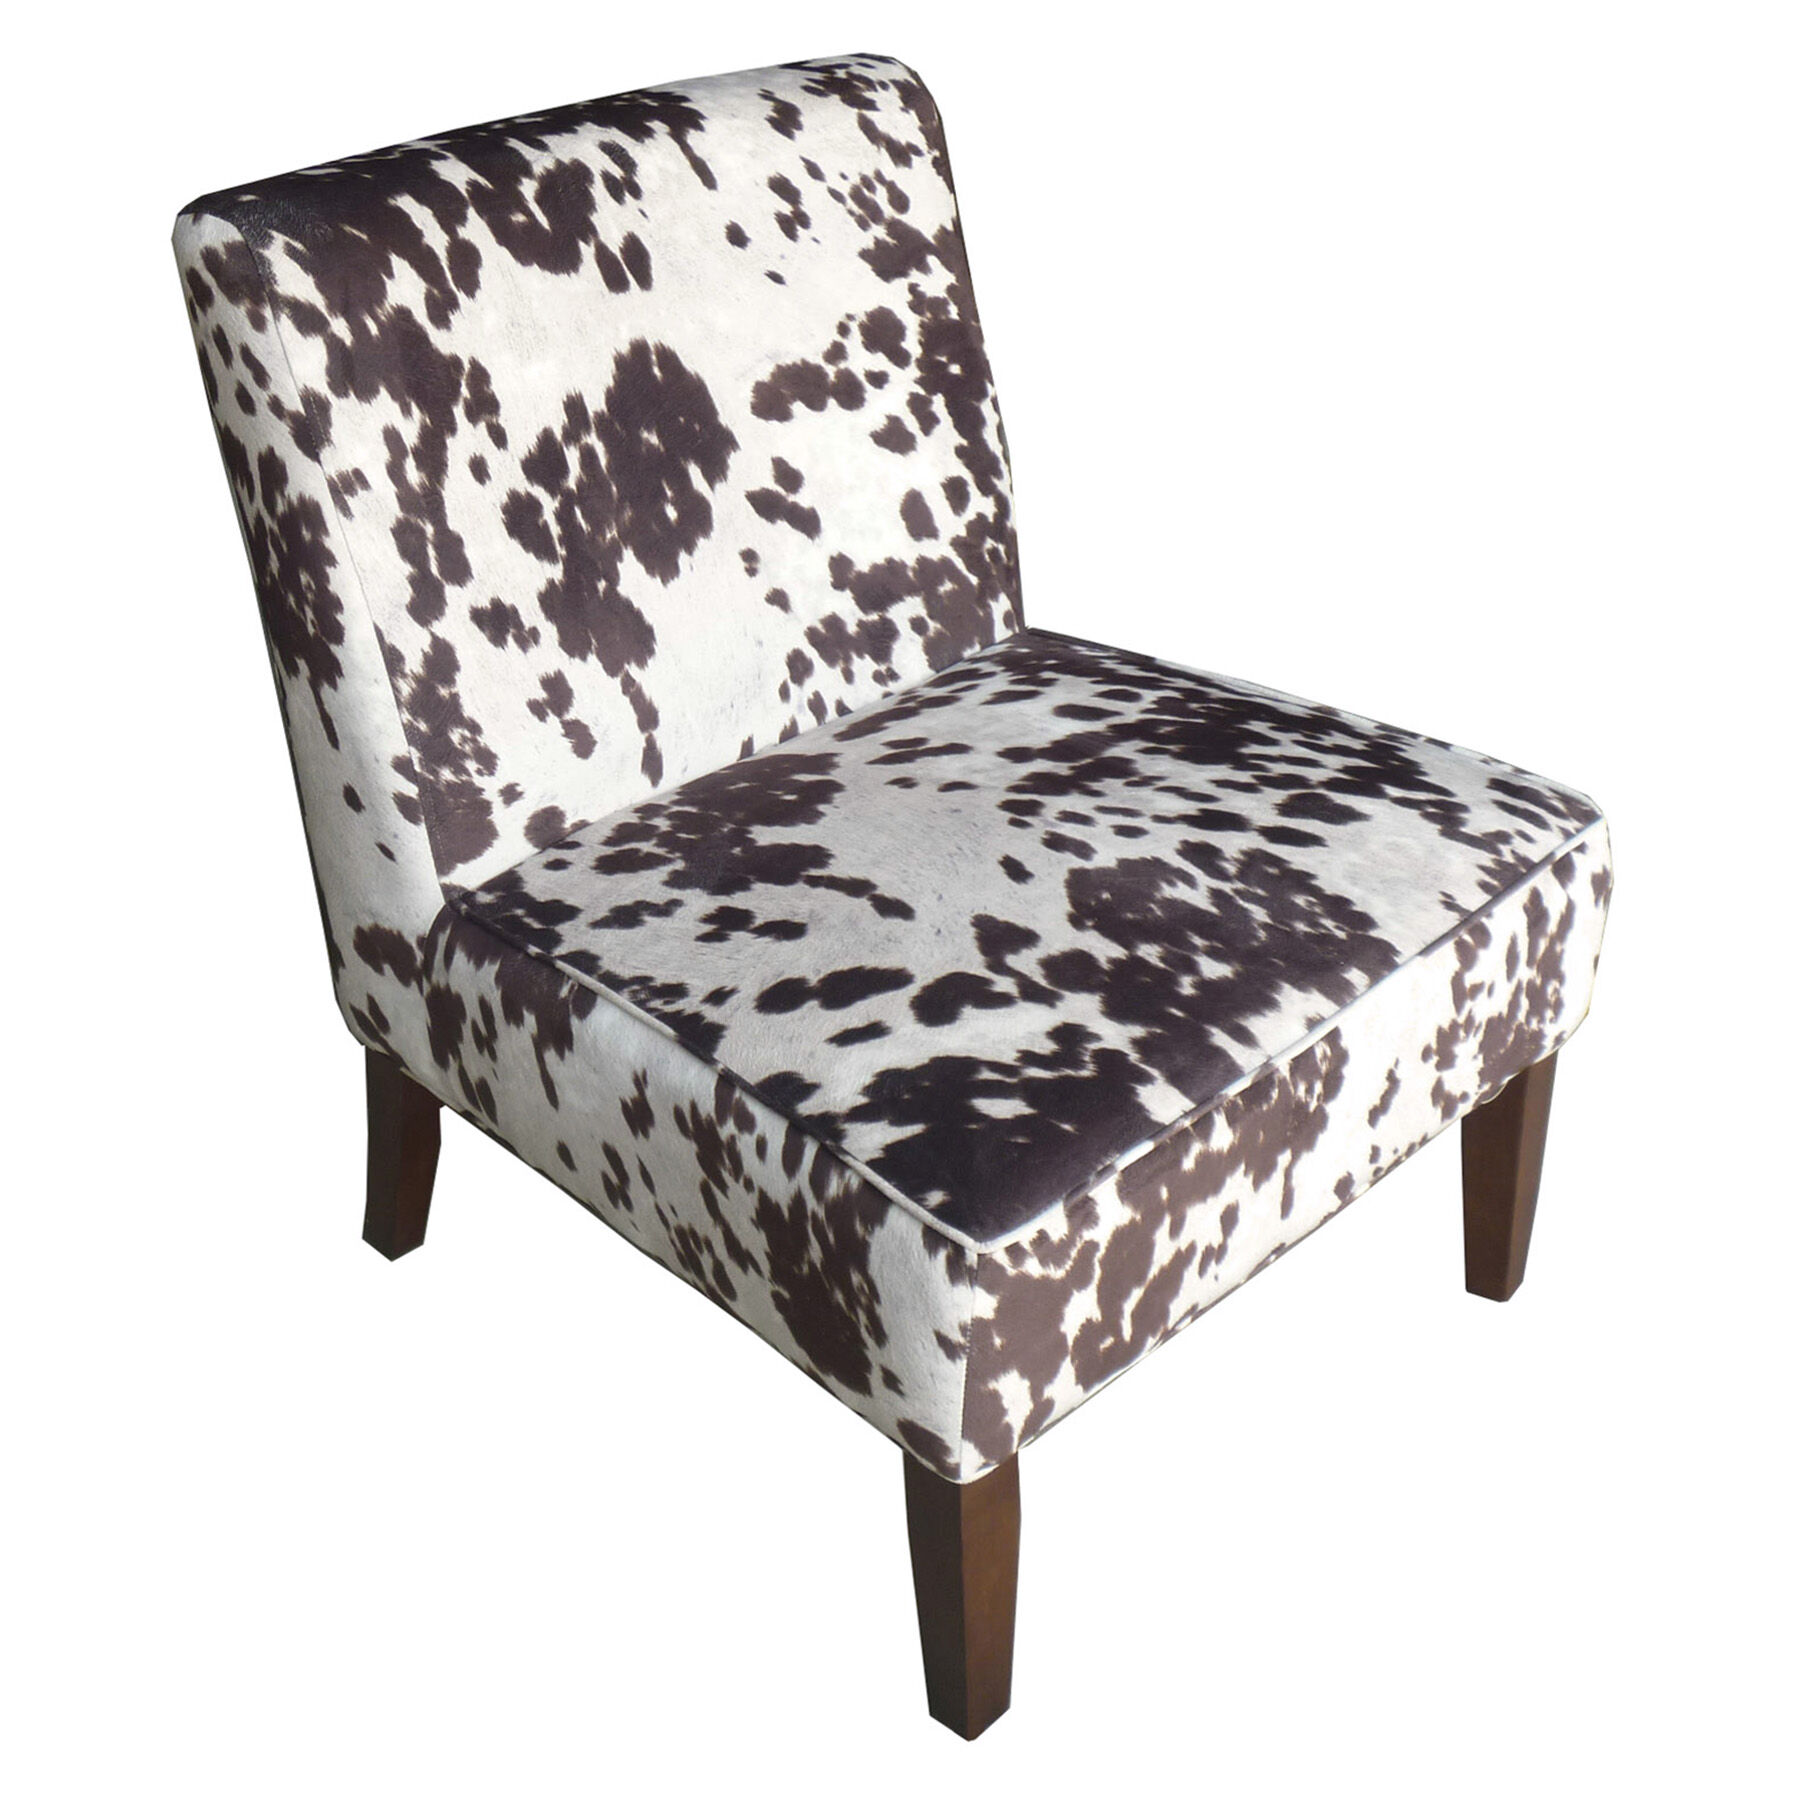 Cowhide Print Fabric Slipper Chair White Brown At Home